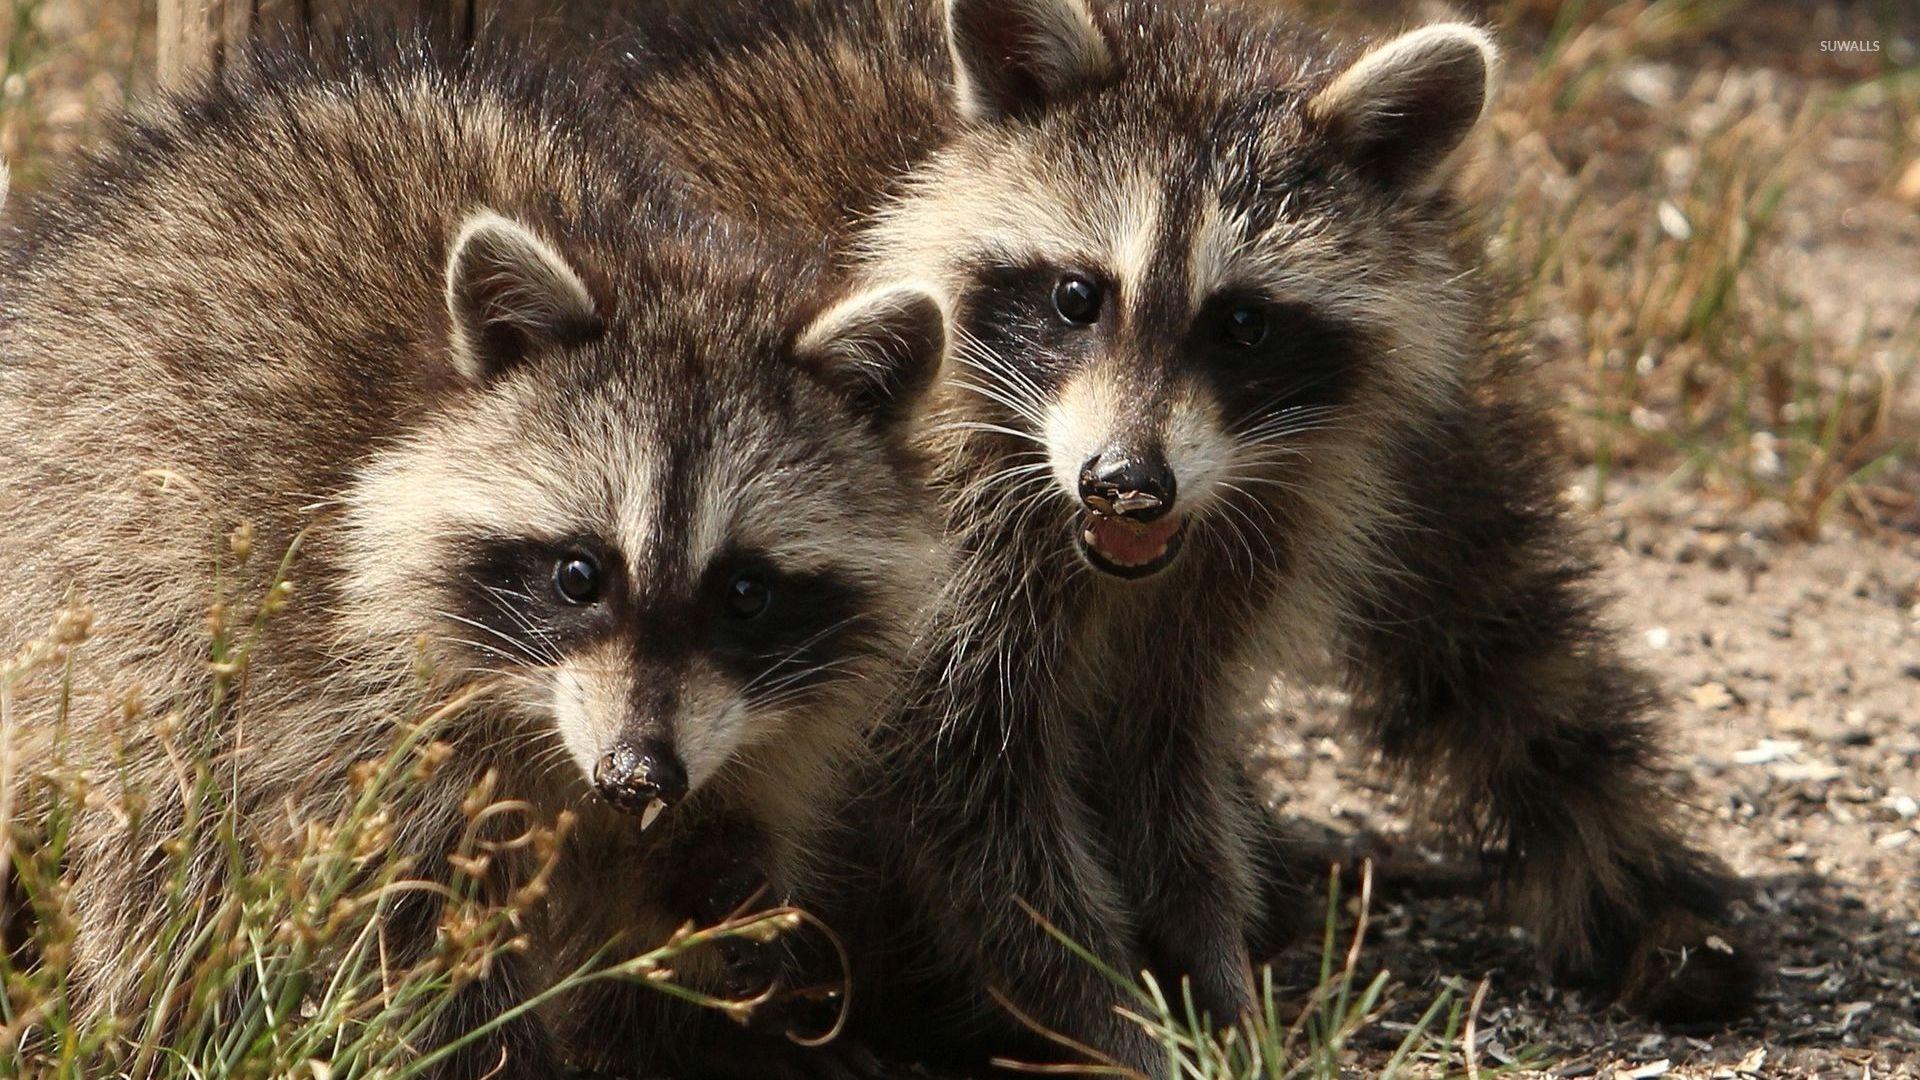 Cute Dog Winter Wallpaper Raccoons Wallpaper Animal Wallpapers 46782